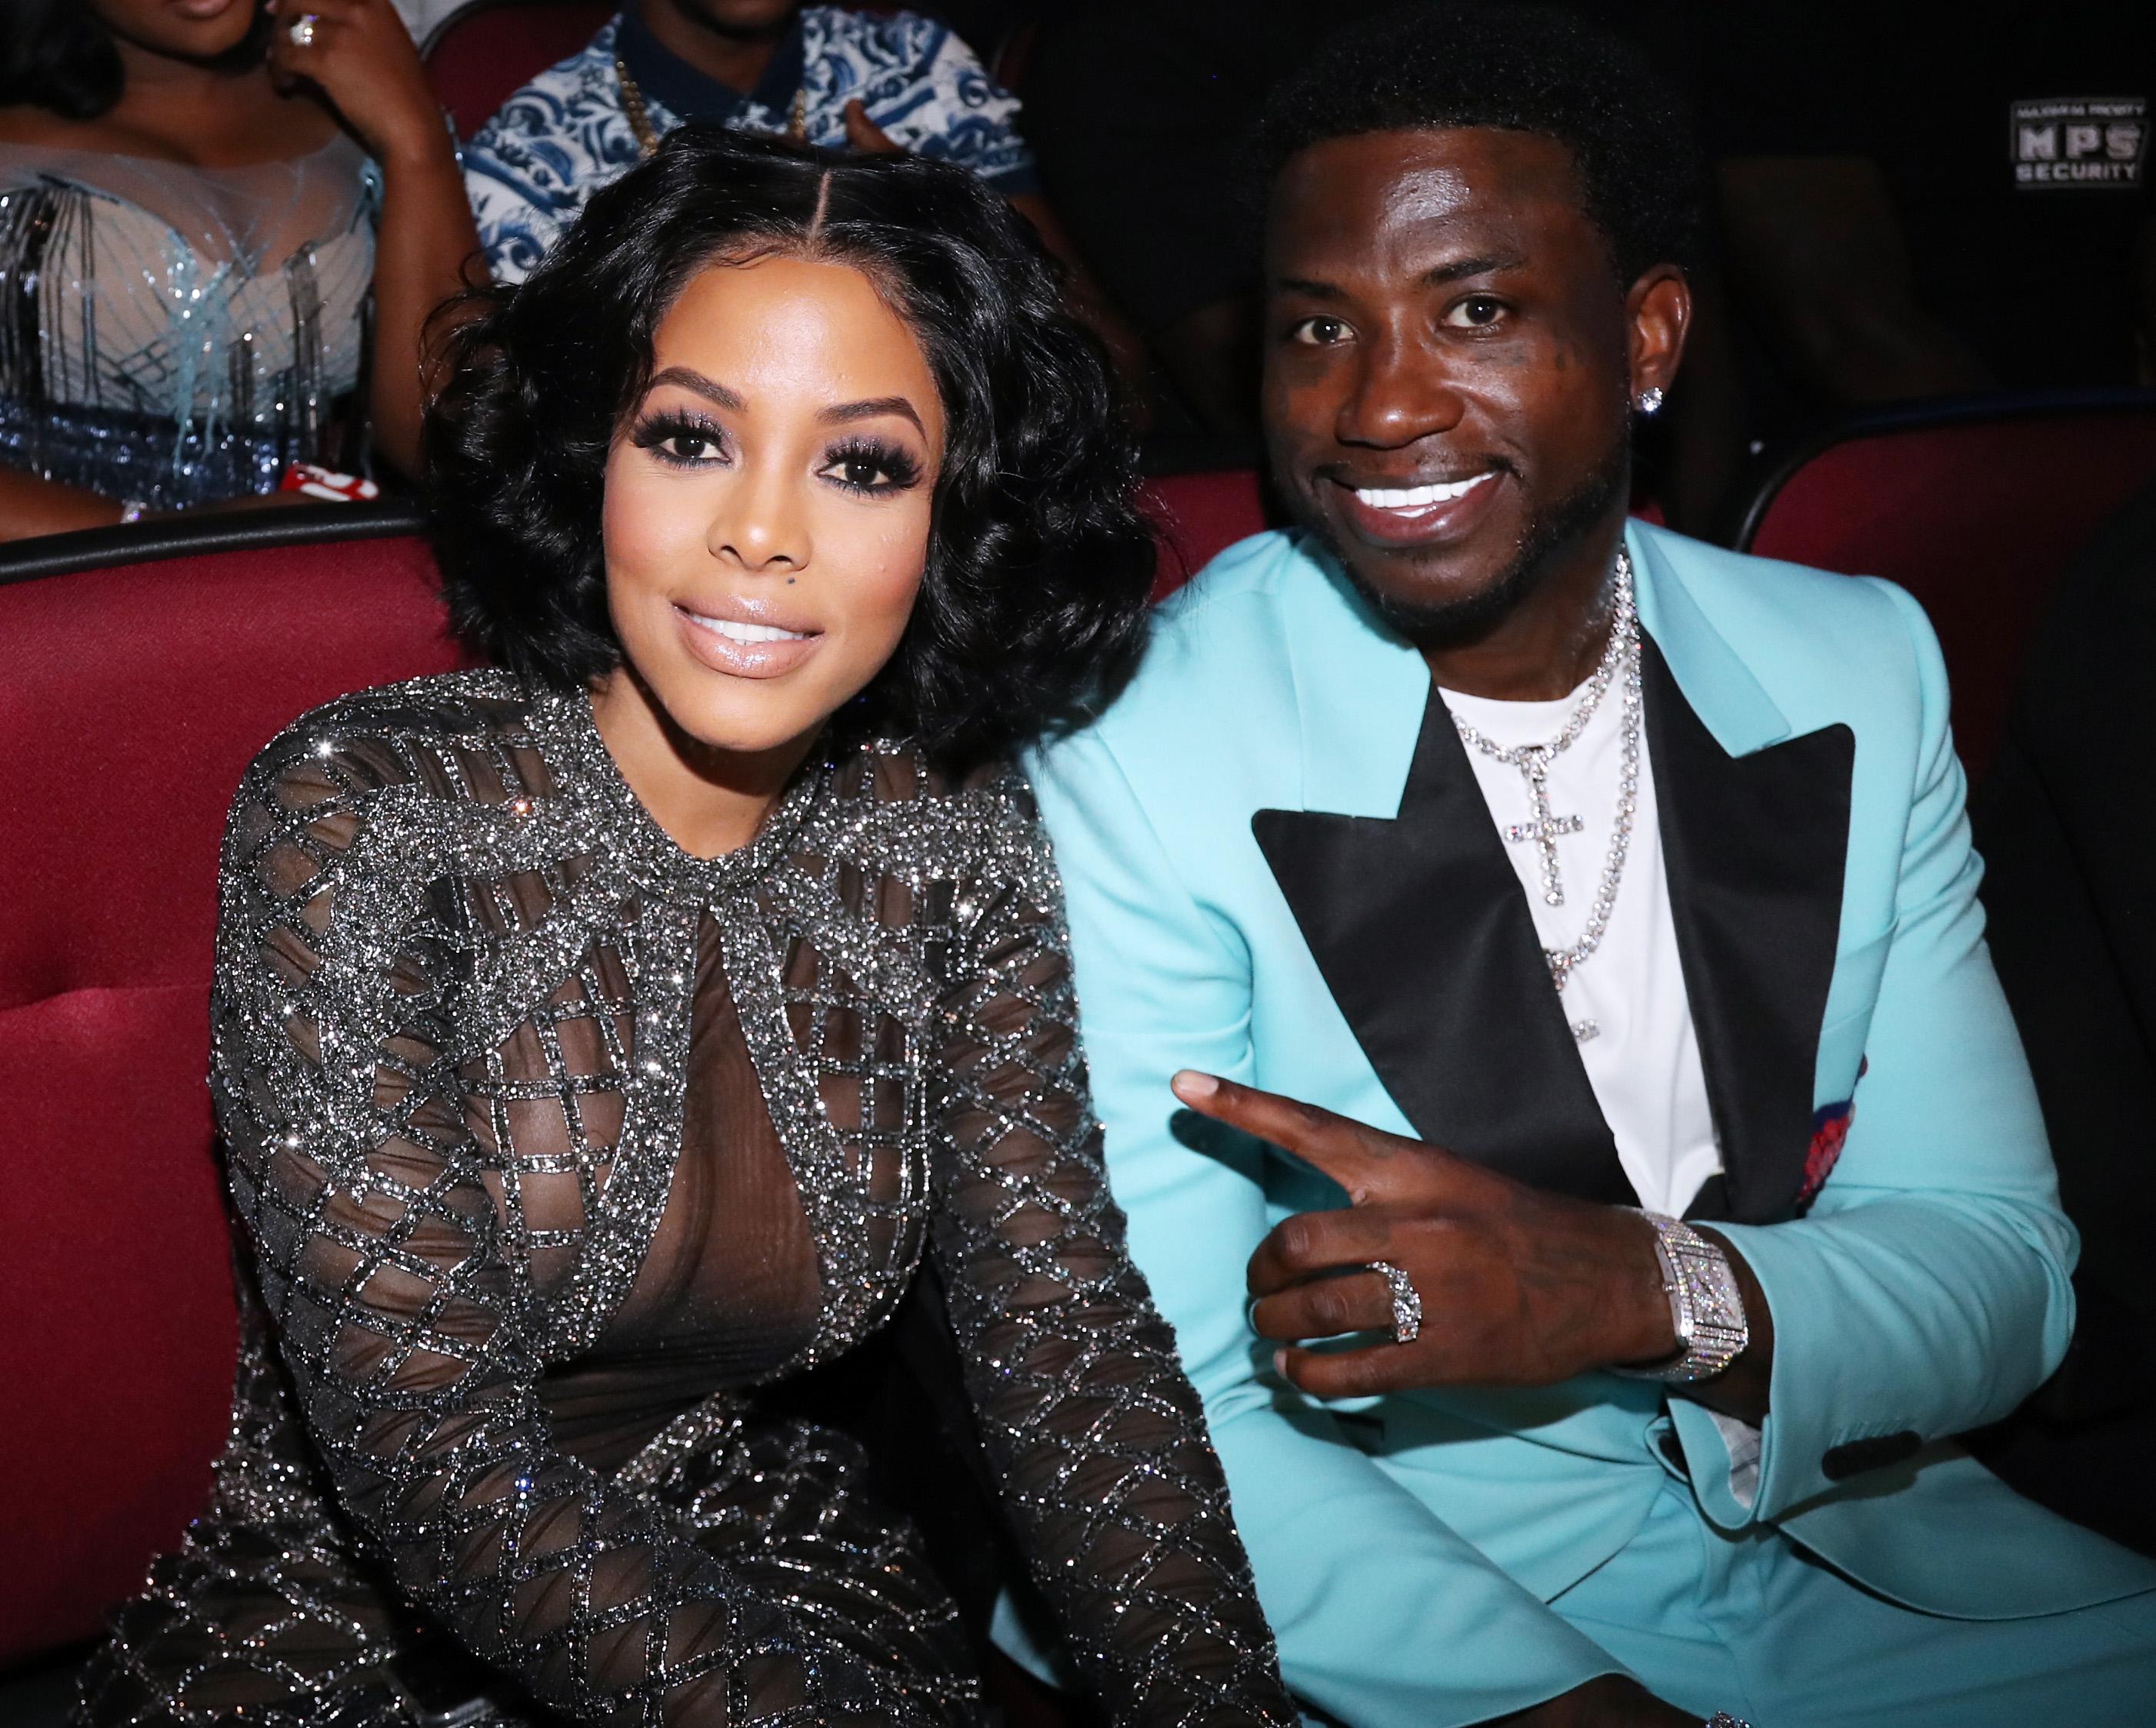 Husband and wife: Gucci Mane and Keyshia Ka'oir